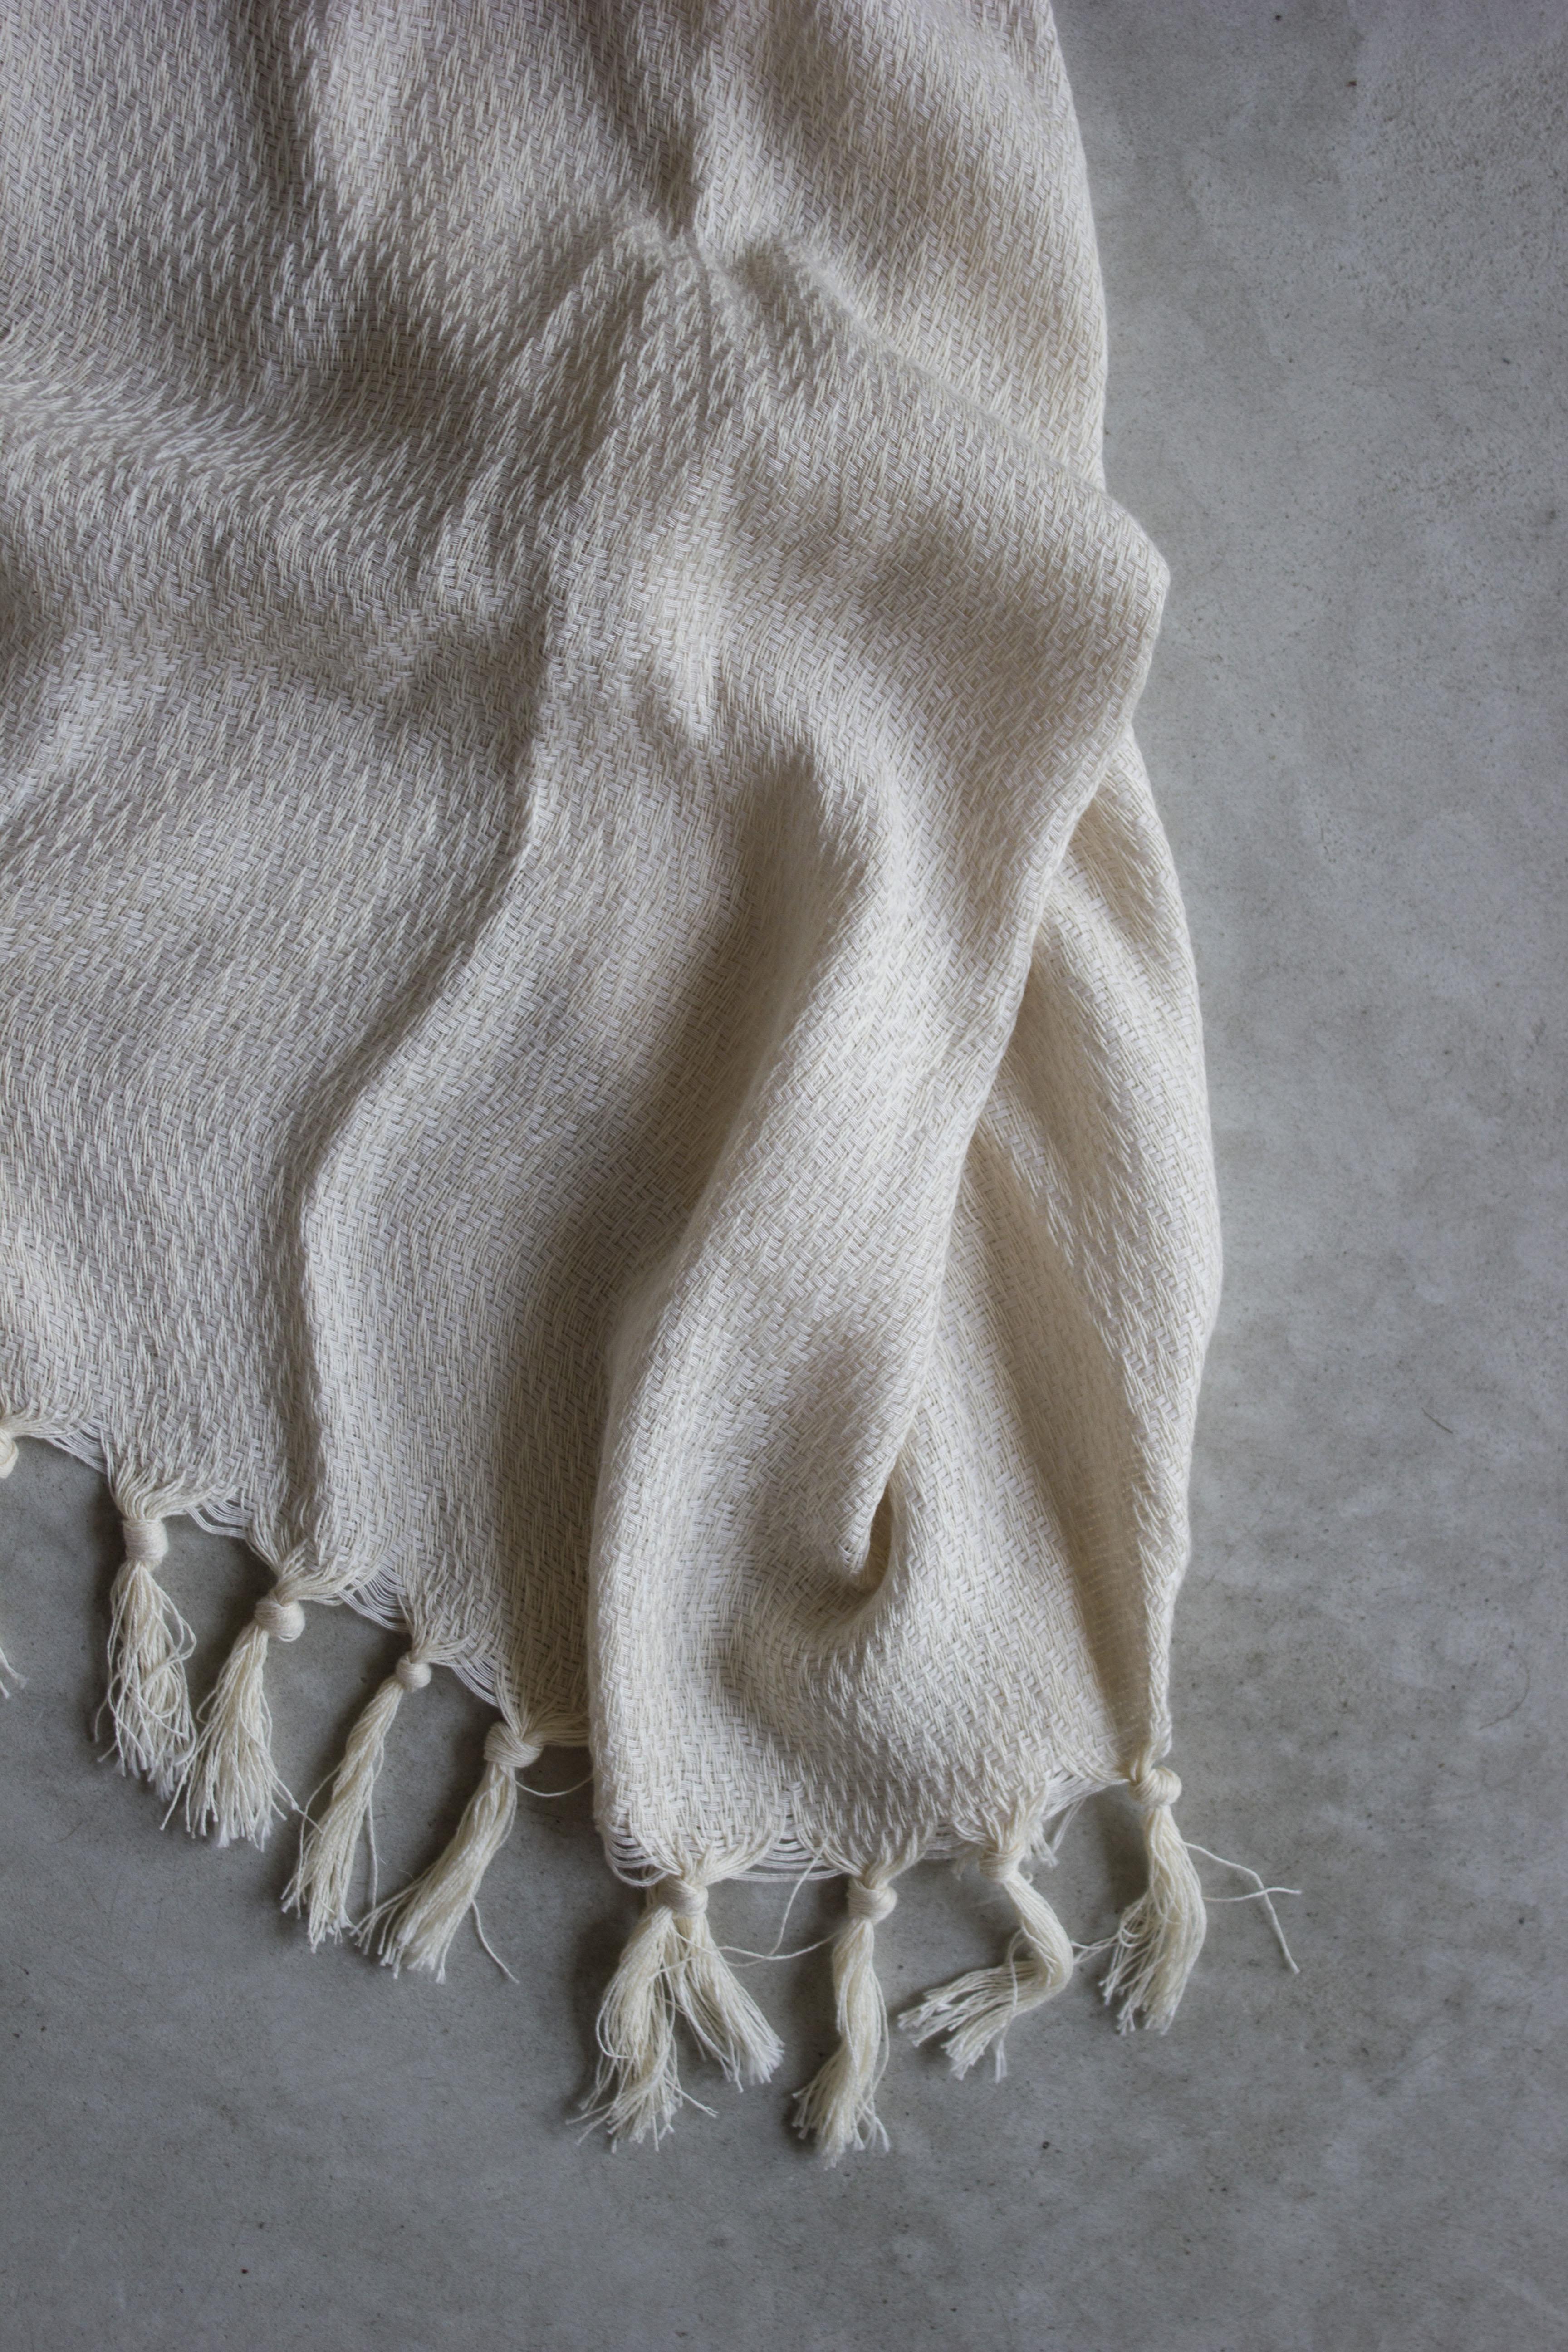 Towel 41 low res